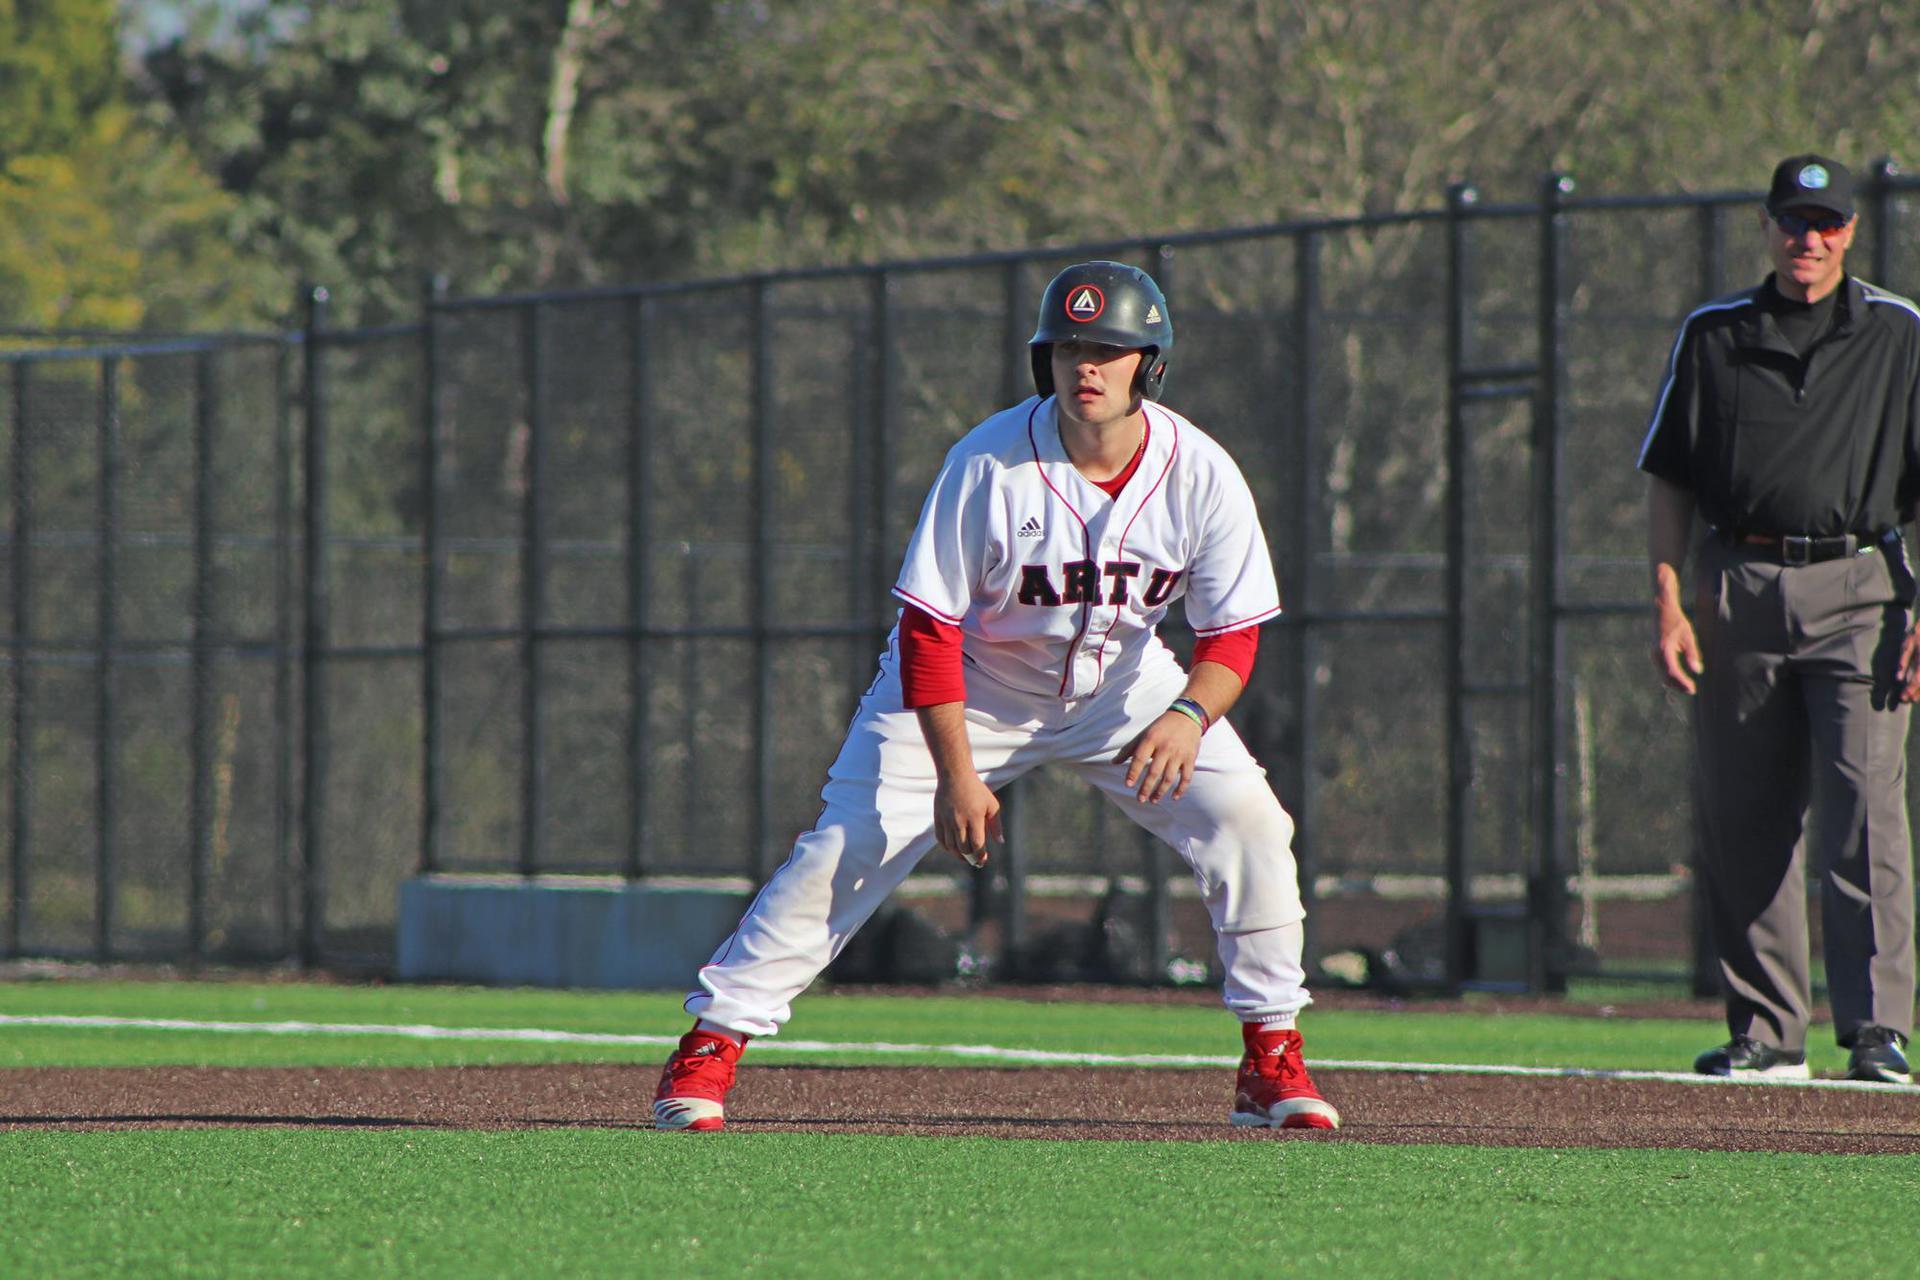 Ryan Gamboa - Men's Baseball Team